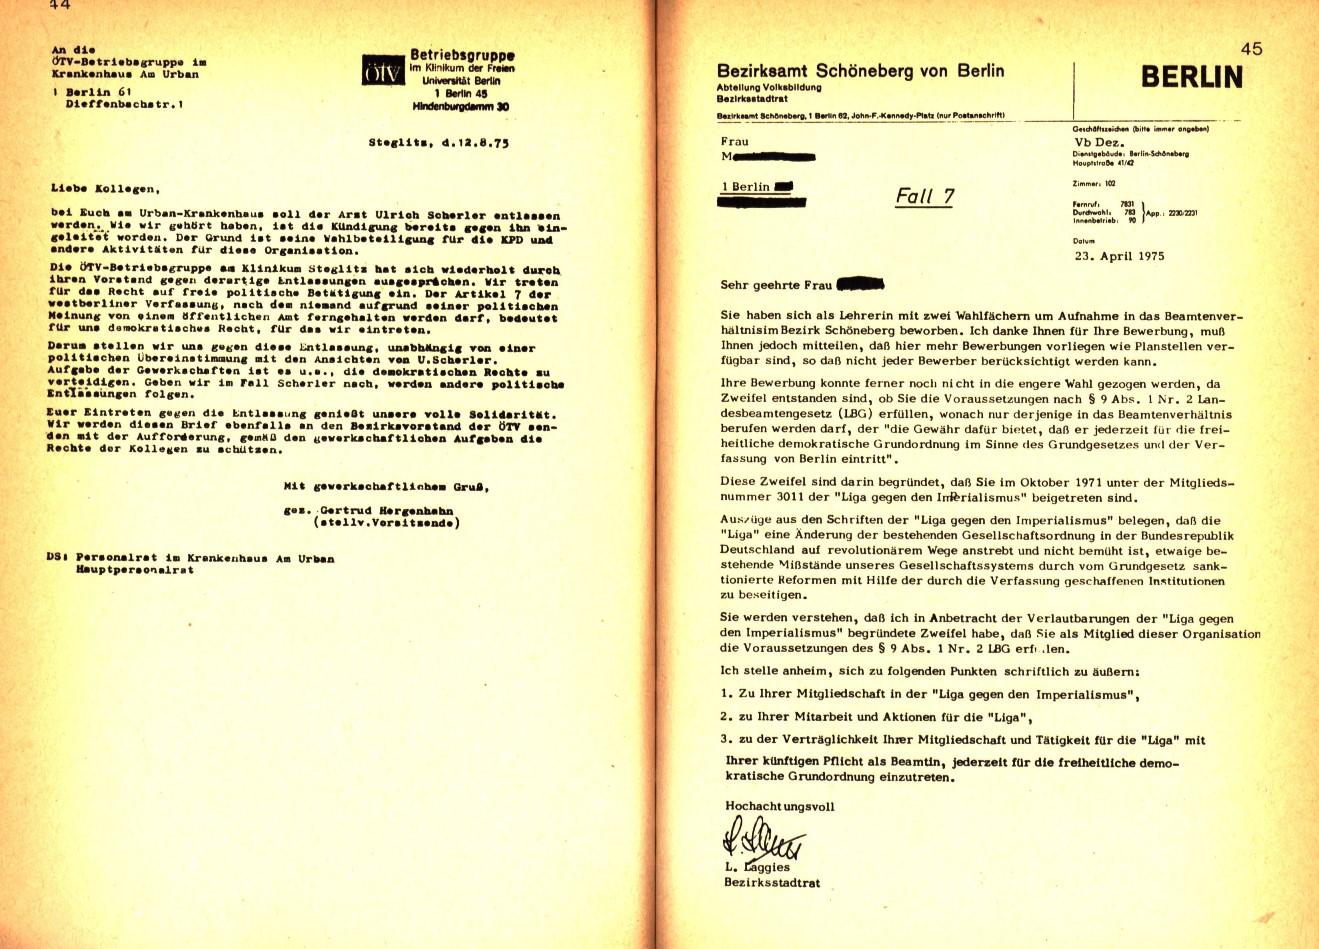 Berlin_VDS_Aktionskomitee_1975_BerufsverboteII_24